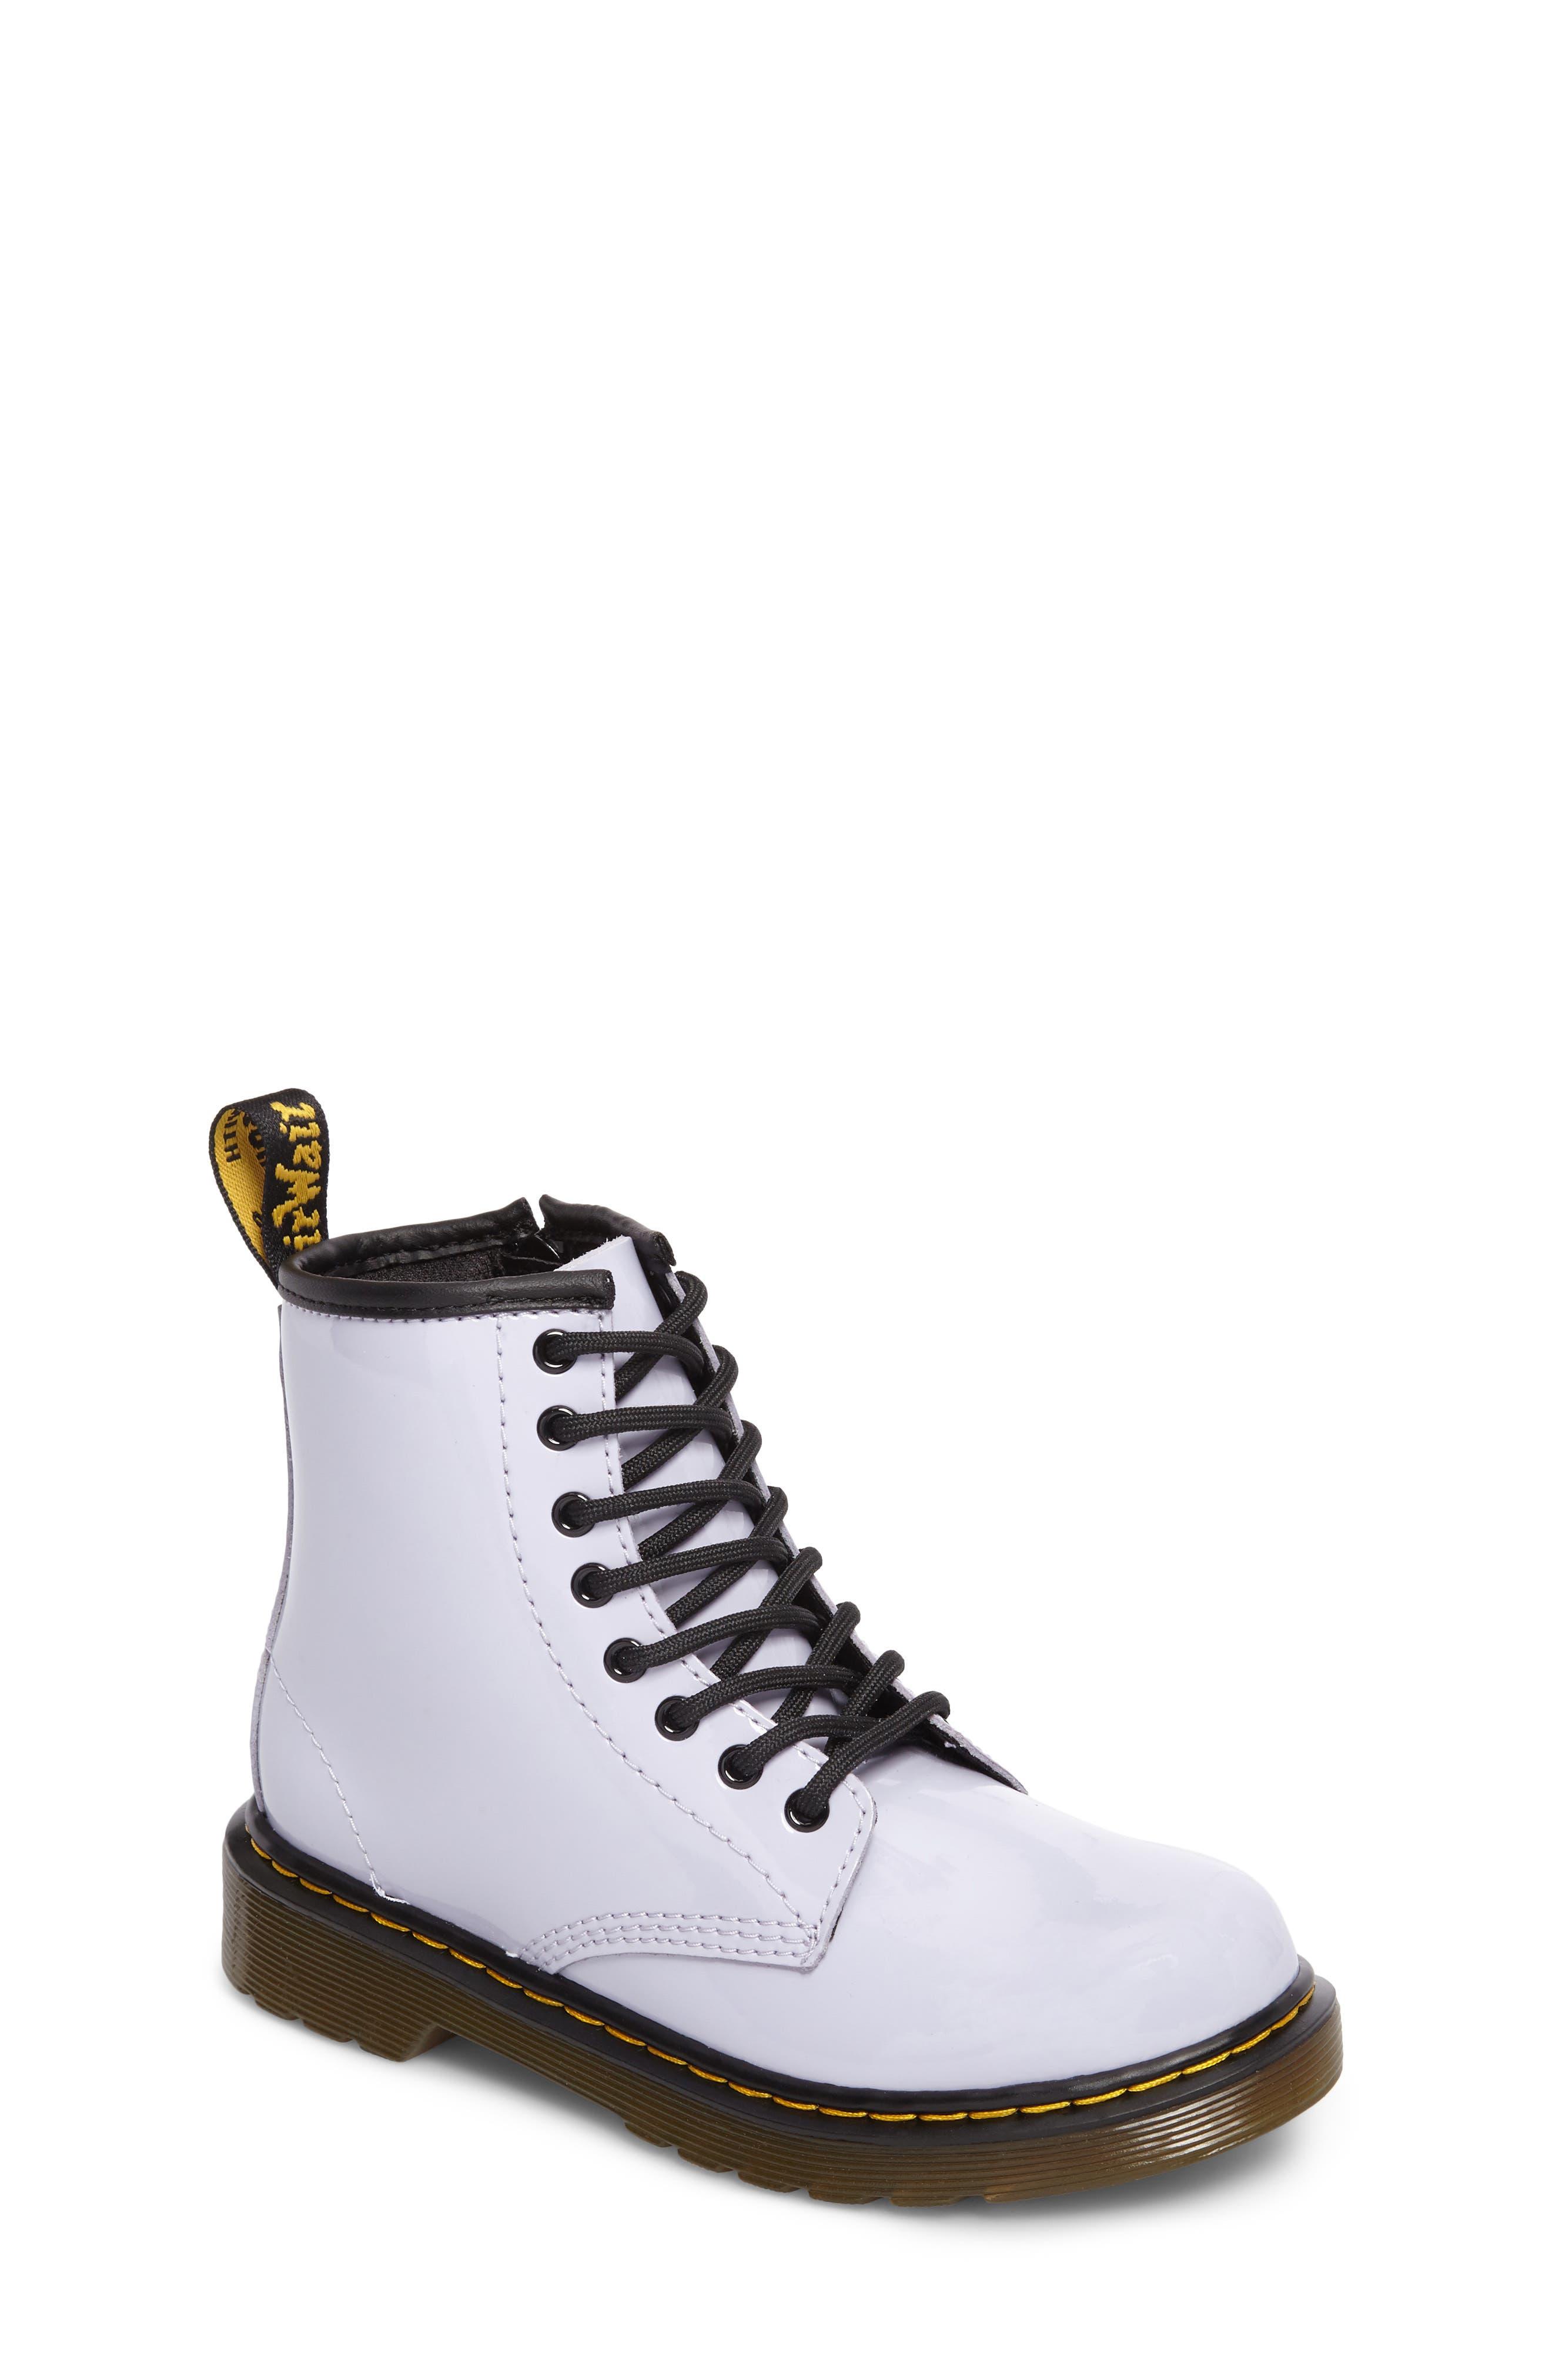 Martens Infant Baby Kids Boys Girls Docs Shoes Black Boots Leather Lace Up Dr